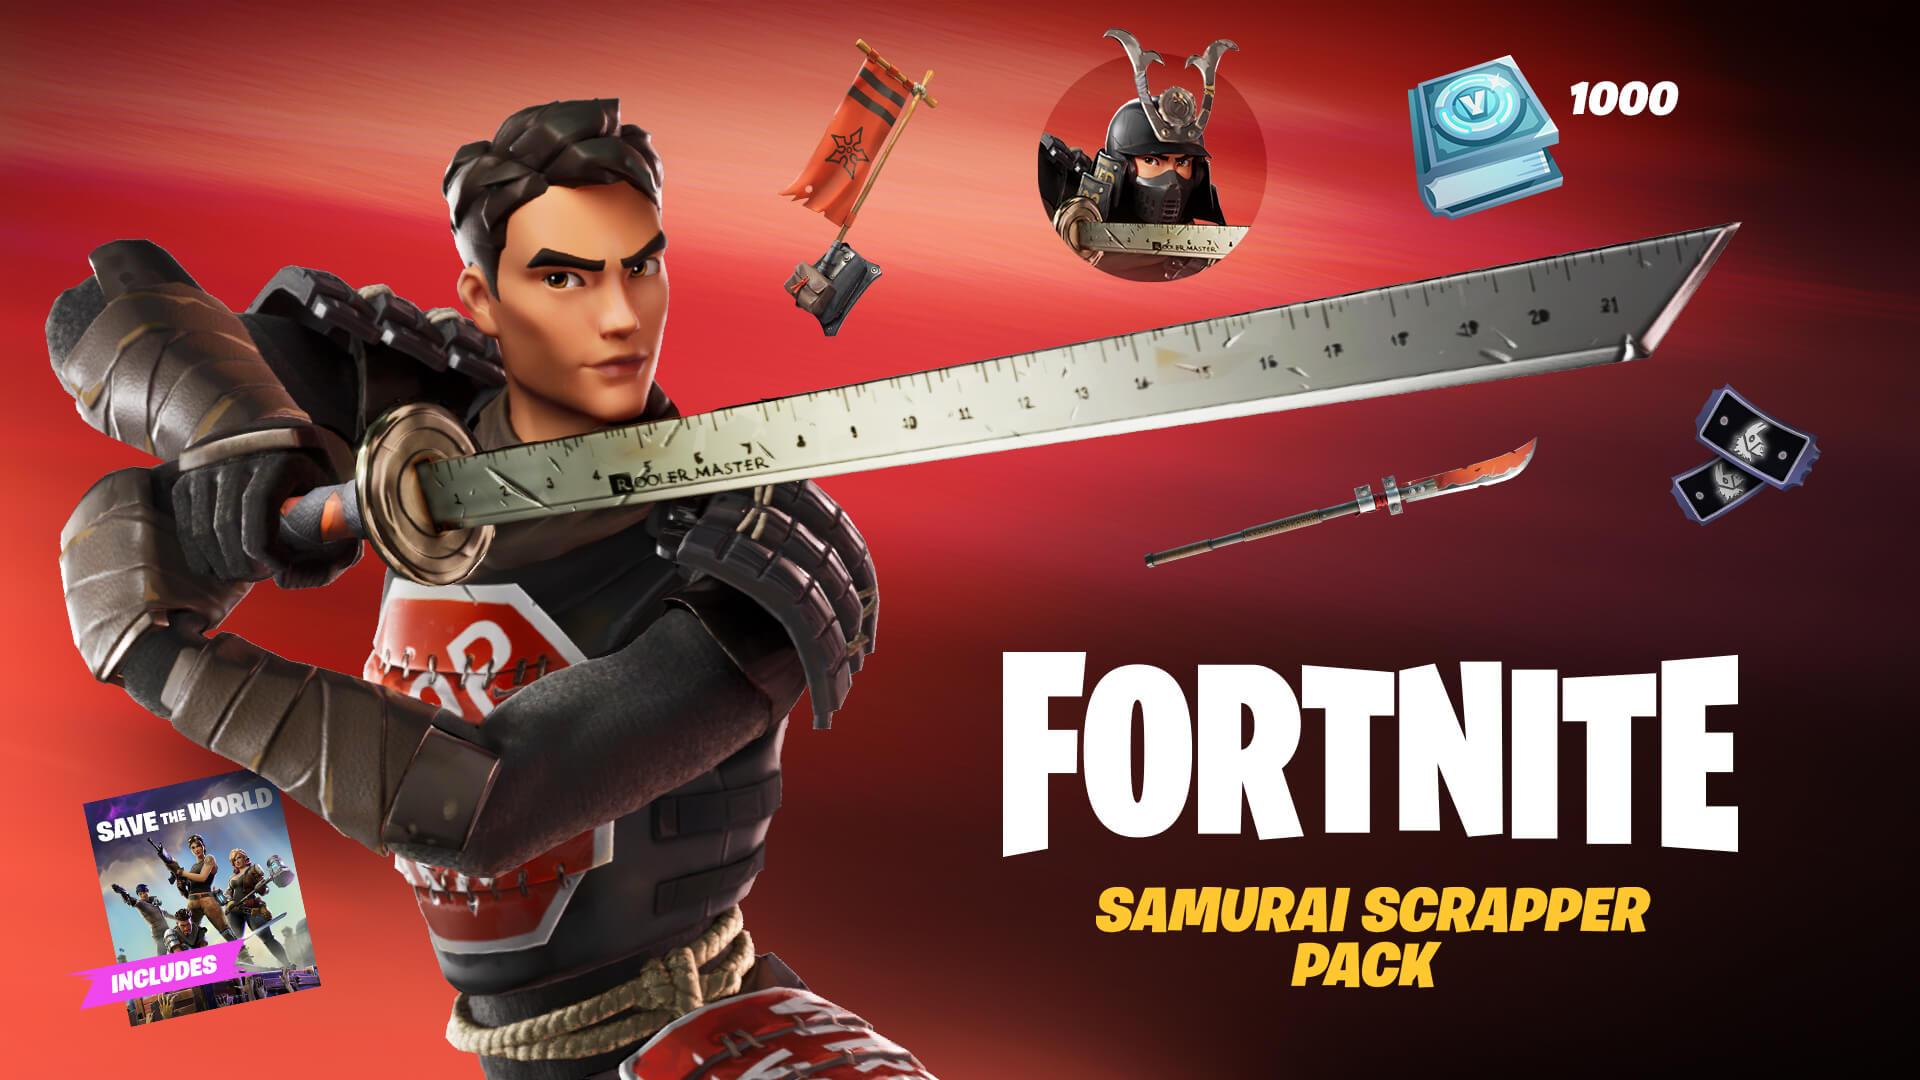 EN StW SamuraiScrapper Social 1920x1080